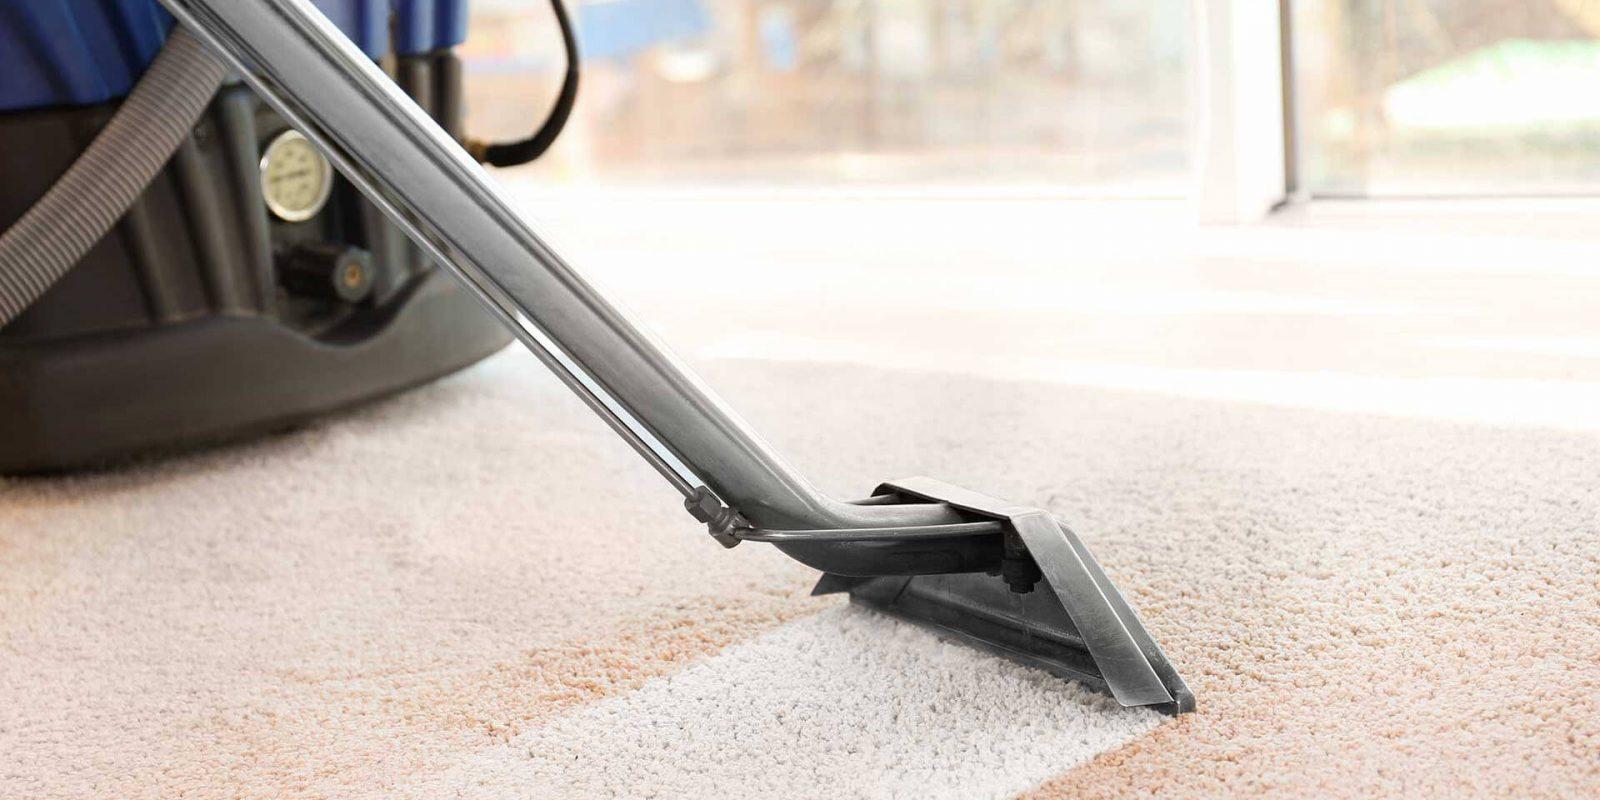 Čišćenje tepiha parom - antibakterijsko, antialergijsko